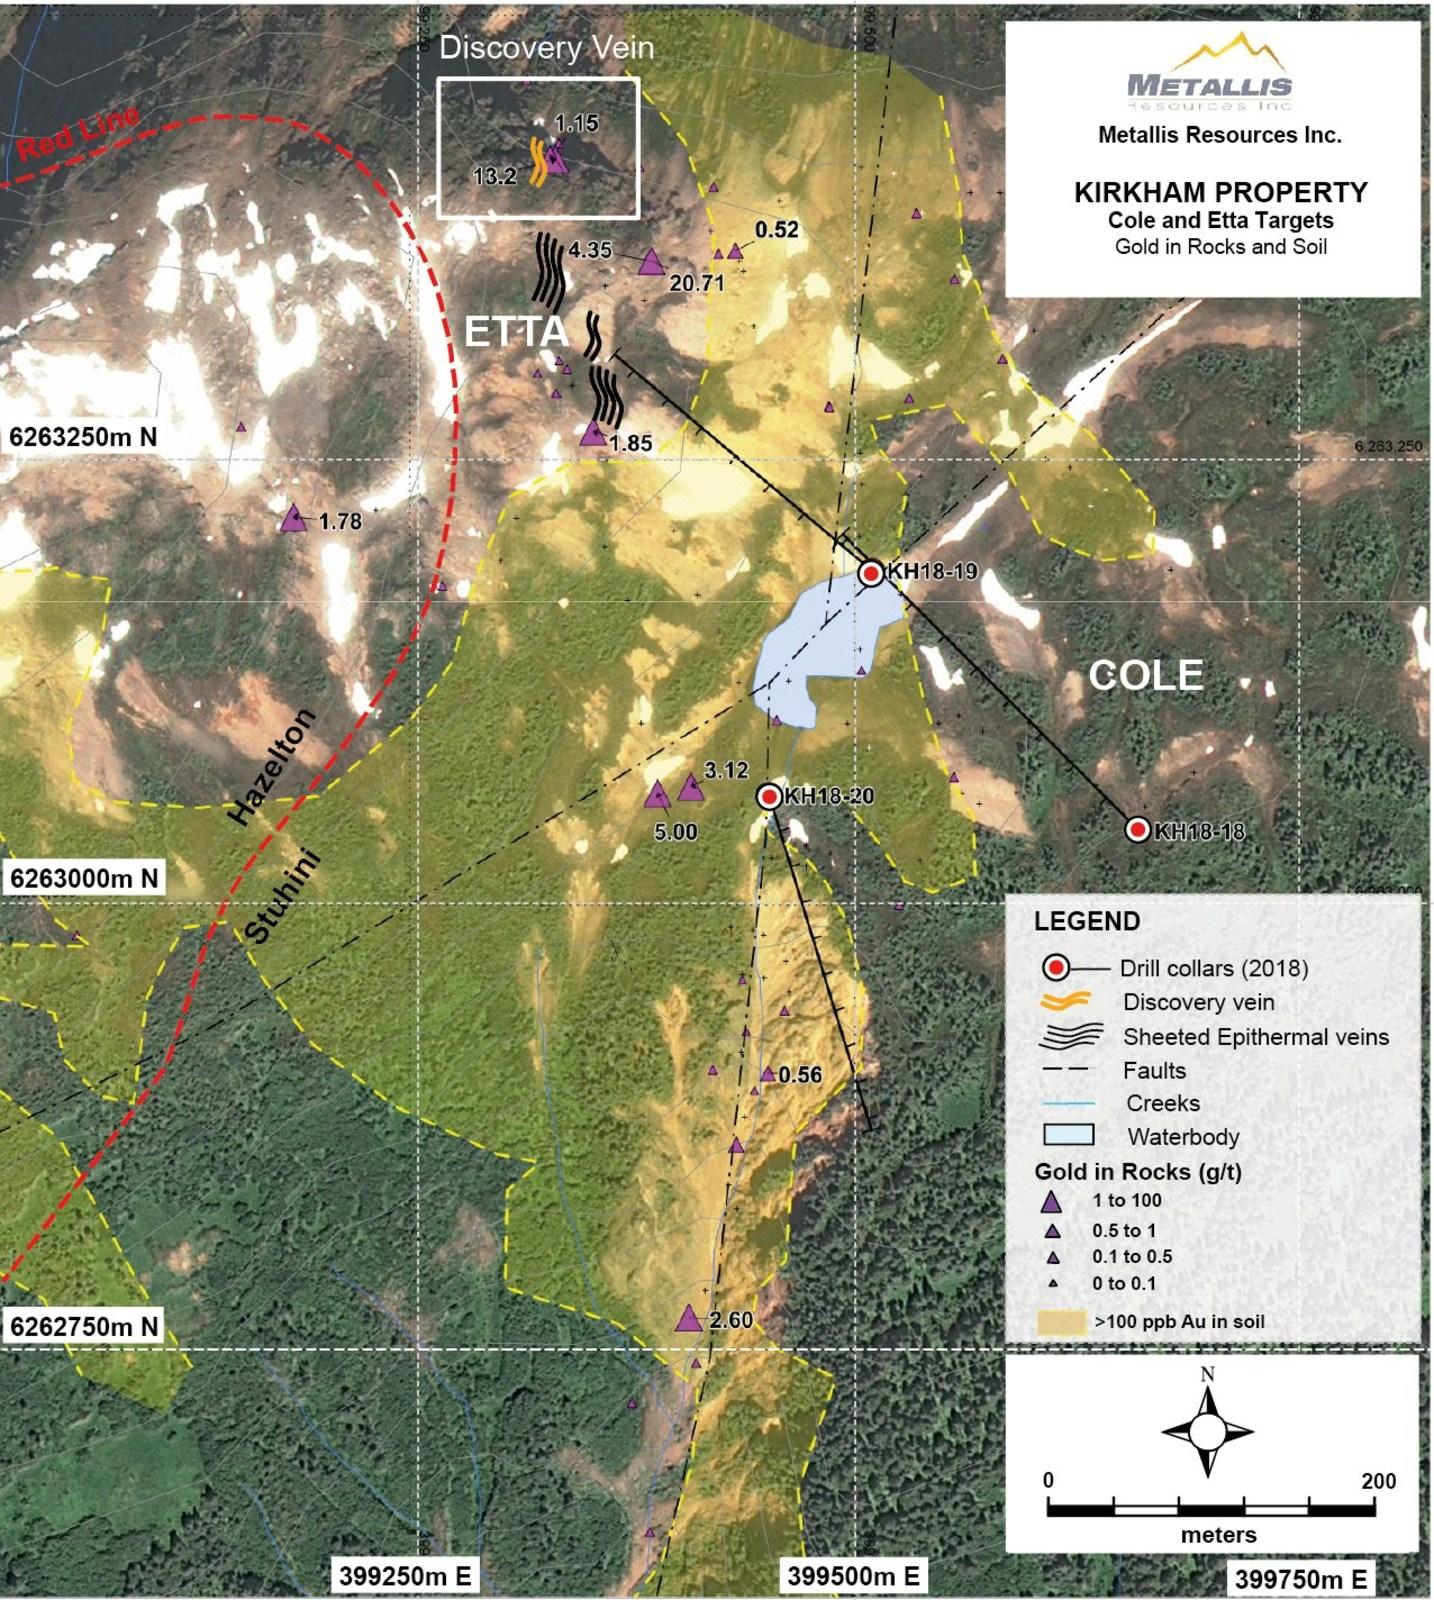 Metallis Resources Inc - Etta & Cole Targets  - GeoChem Map